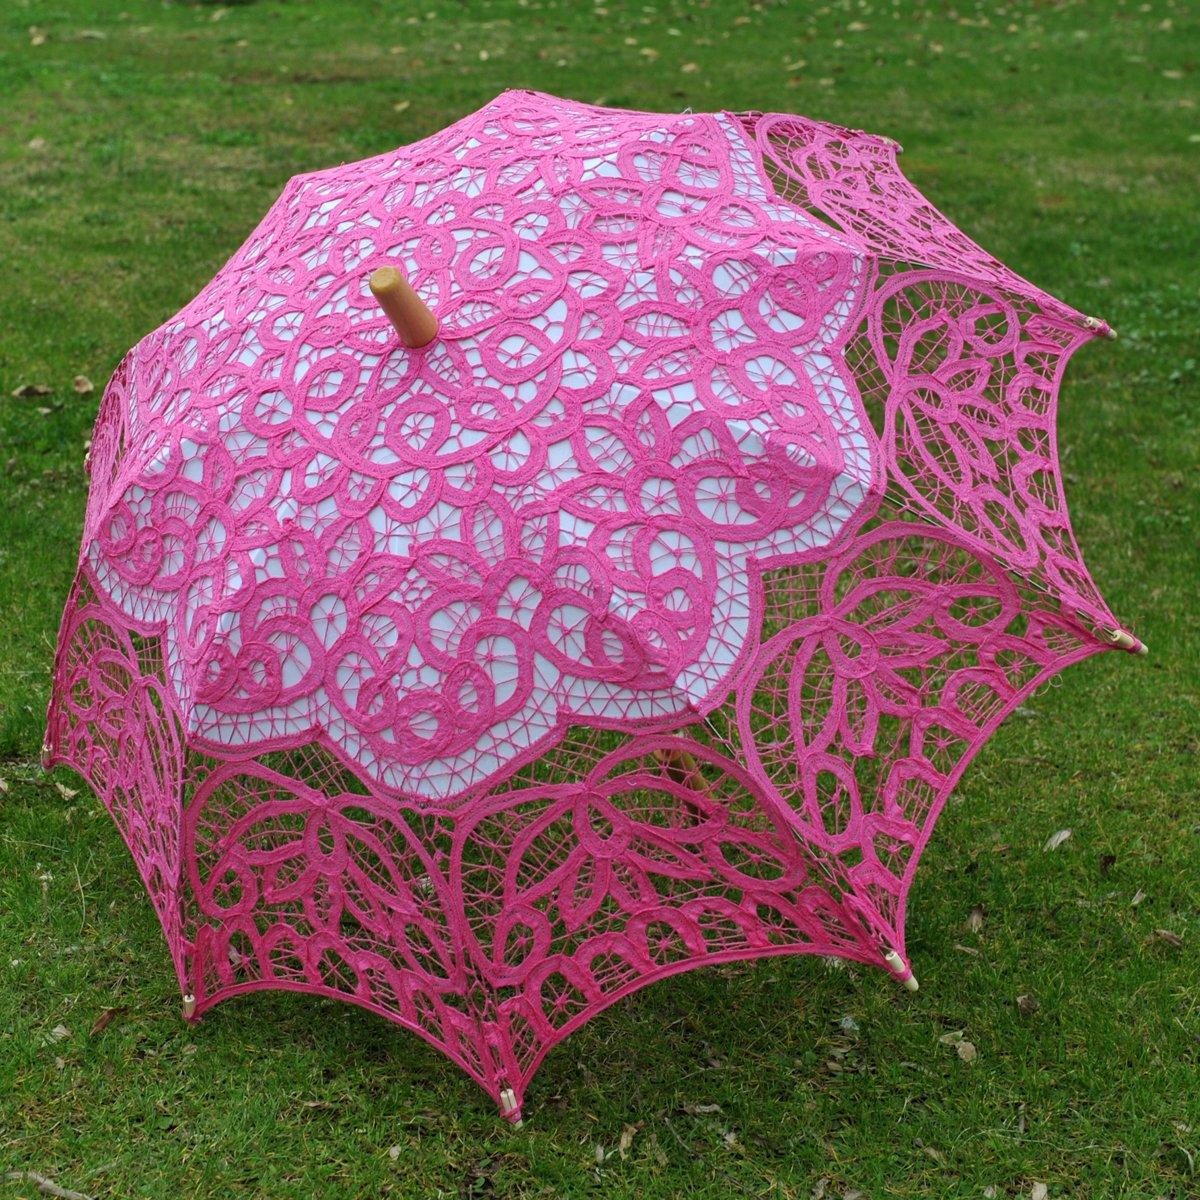 Topwedding Classic Cotton Lace Parasol Umbrella Bridal Shower Decoration, Fuschia by Topwedding (Image #3)